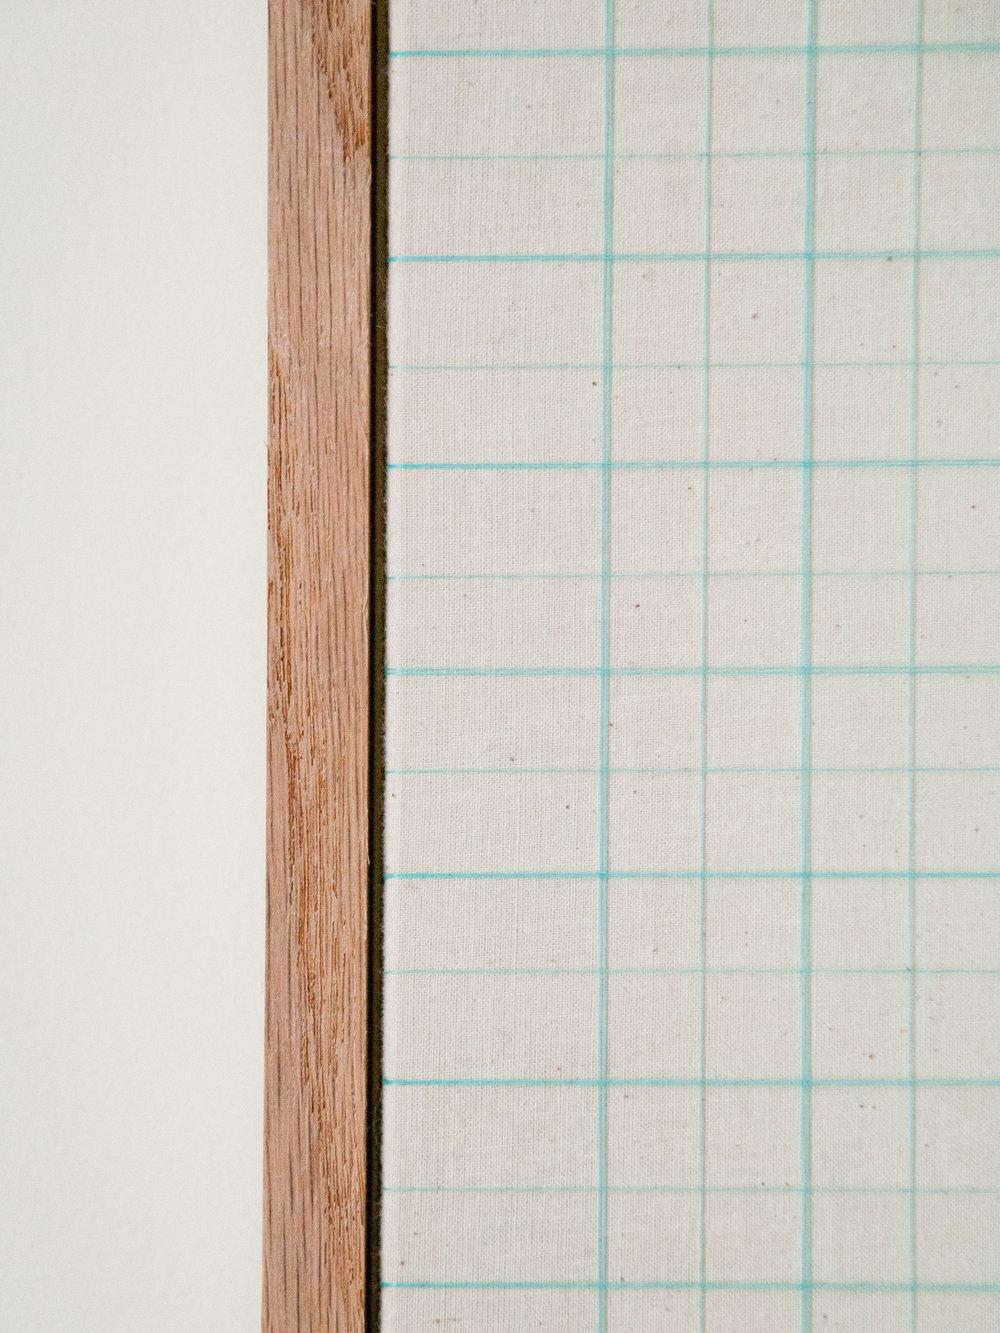 Nicole Patel Aqua Graph Detail 2.jpg